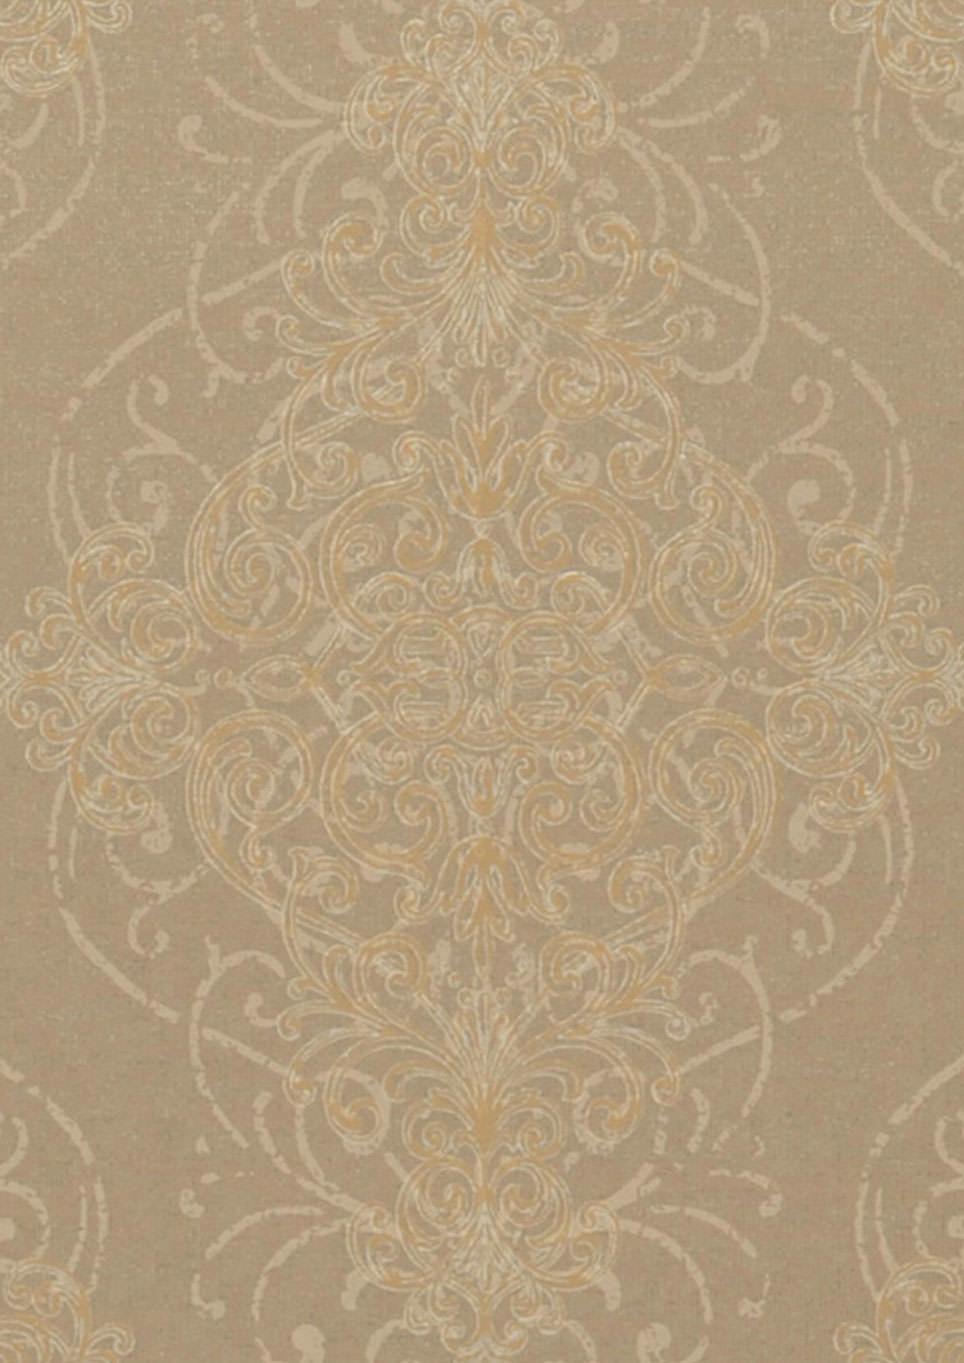 Papel pintado palamedes beige gris ceo beige perla for Muestras color arena